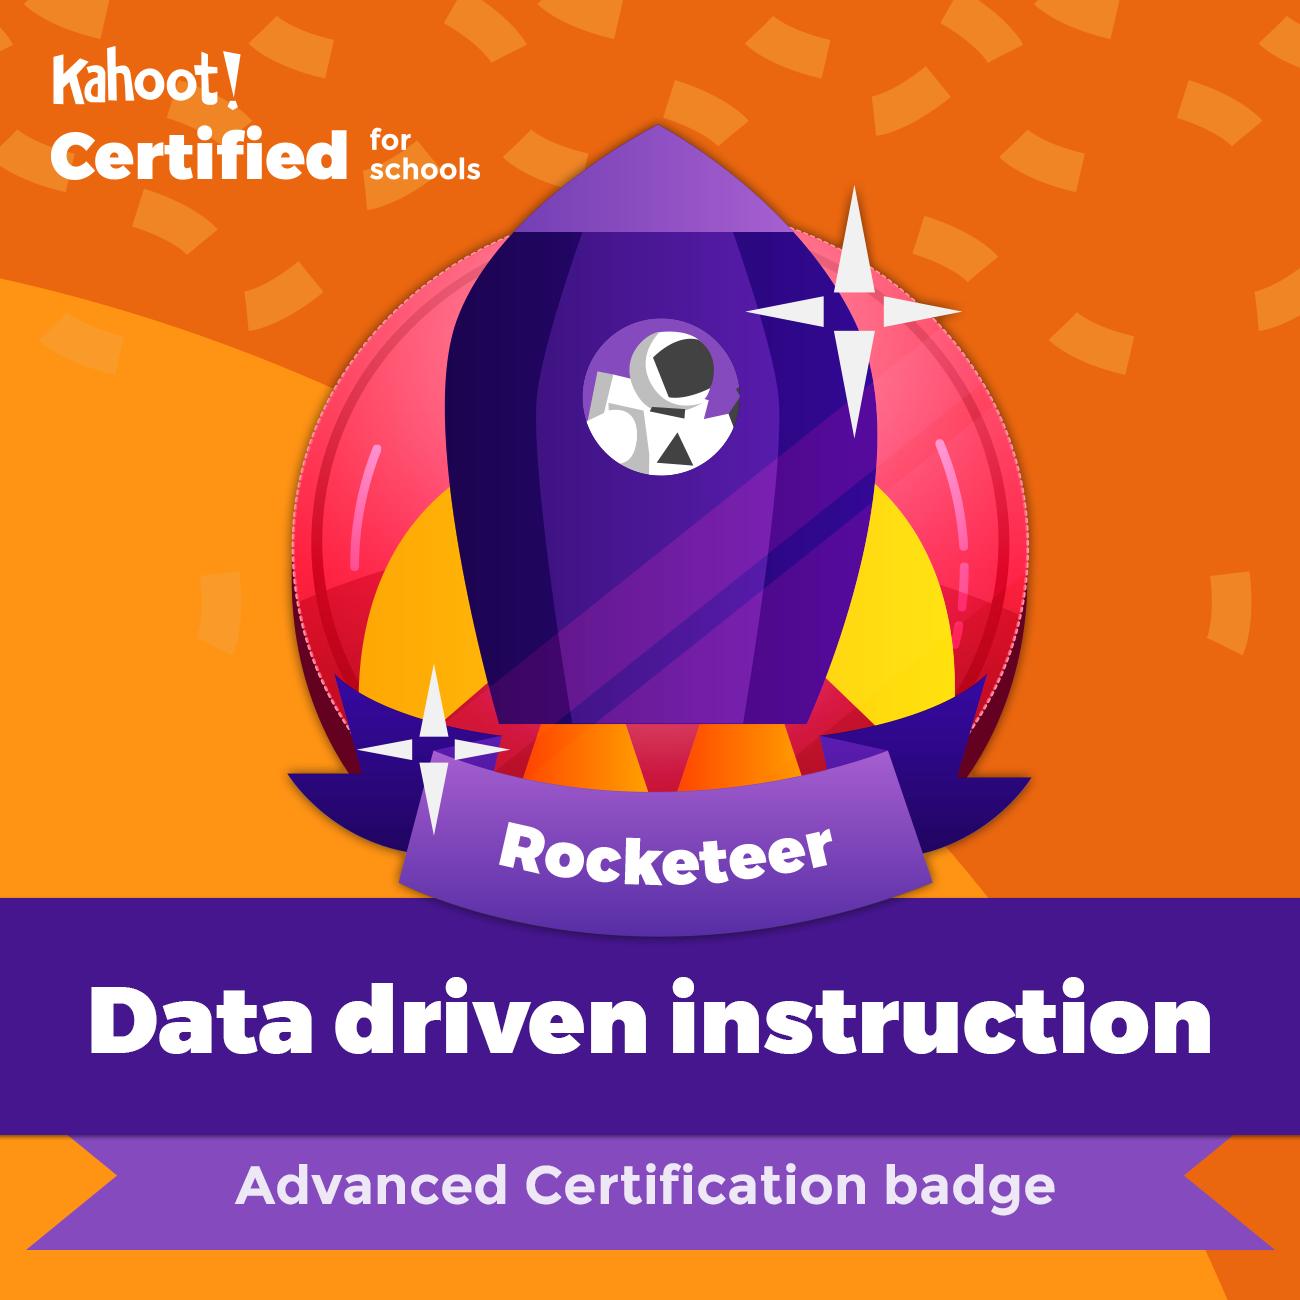 DataDrivenInstruction_Badges-Facebook